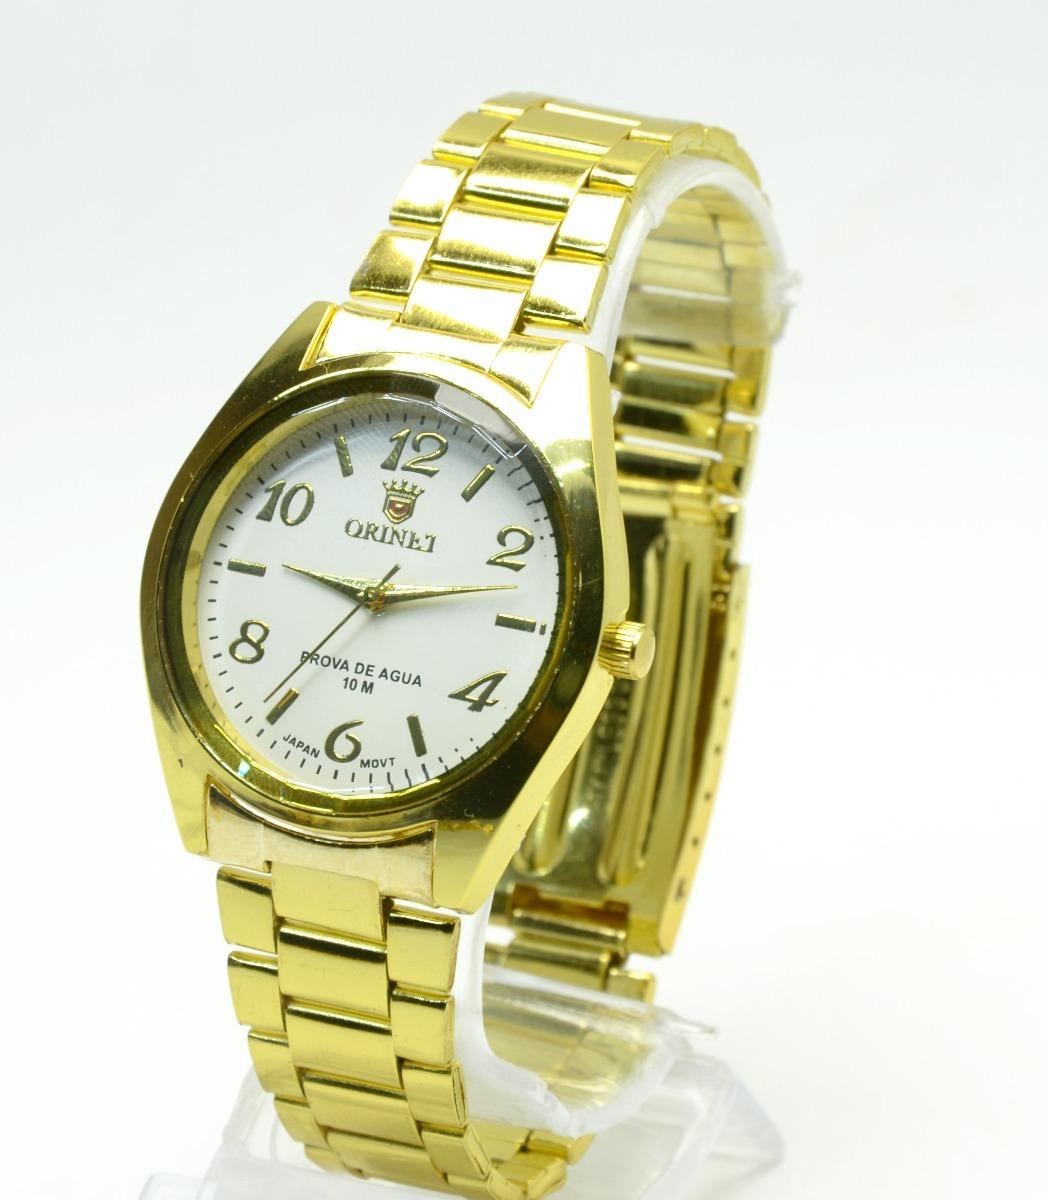 57a884c3195 relógio feminino pulseira dourada lindo barato. Carregando zoom.